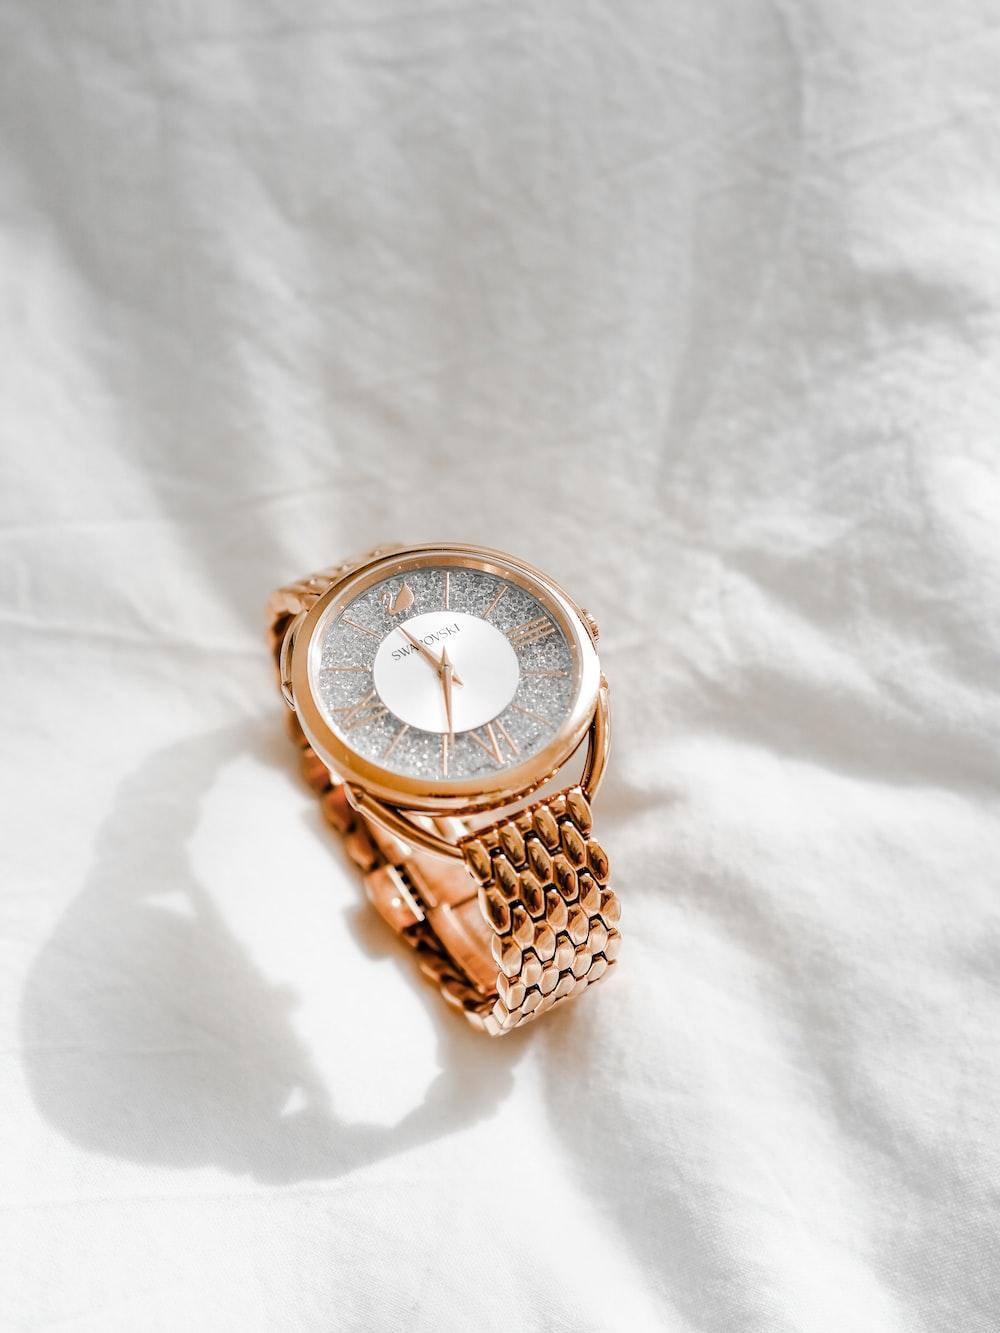 gold link bracelet round analog watch